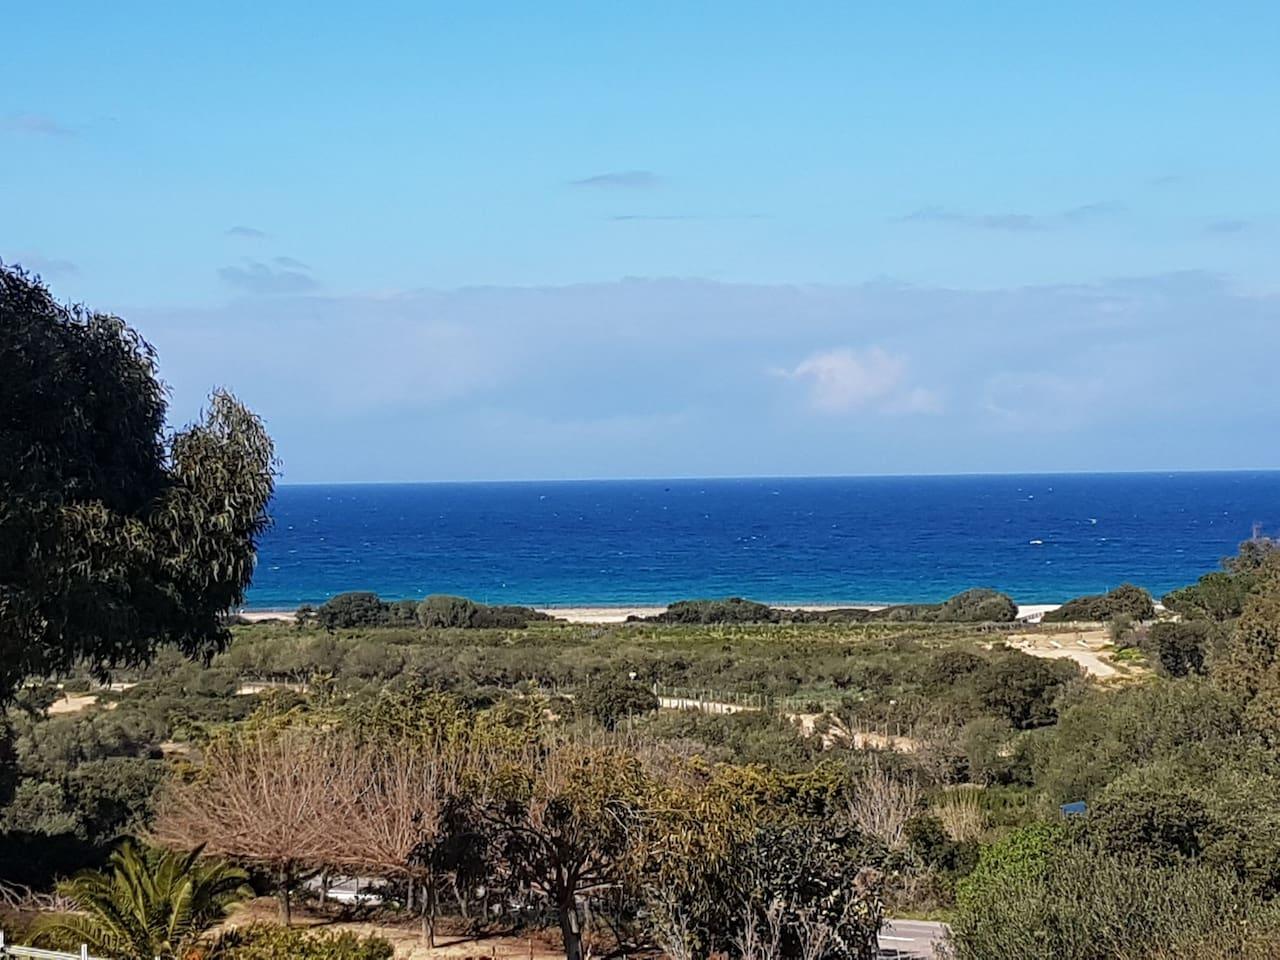 Vue de la mer depuis la terrasse.